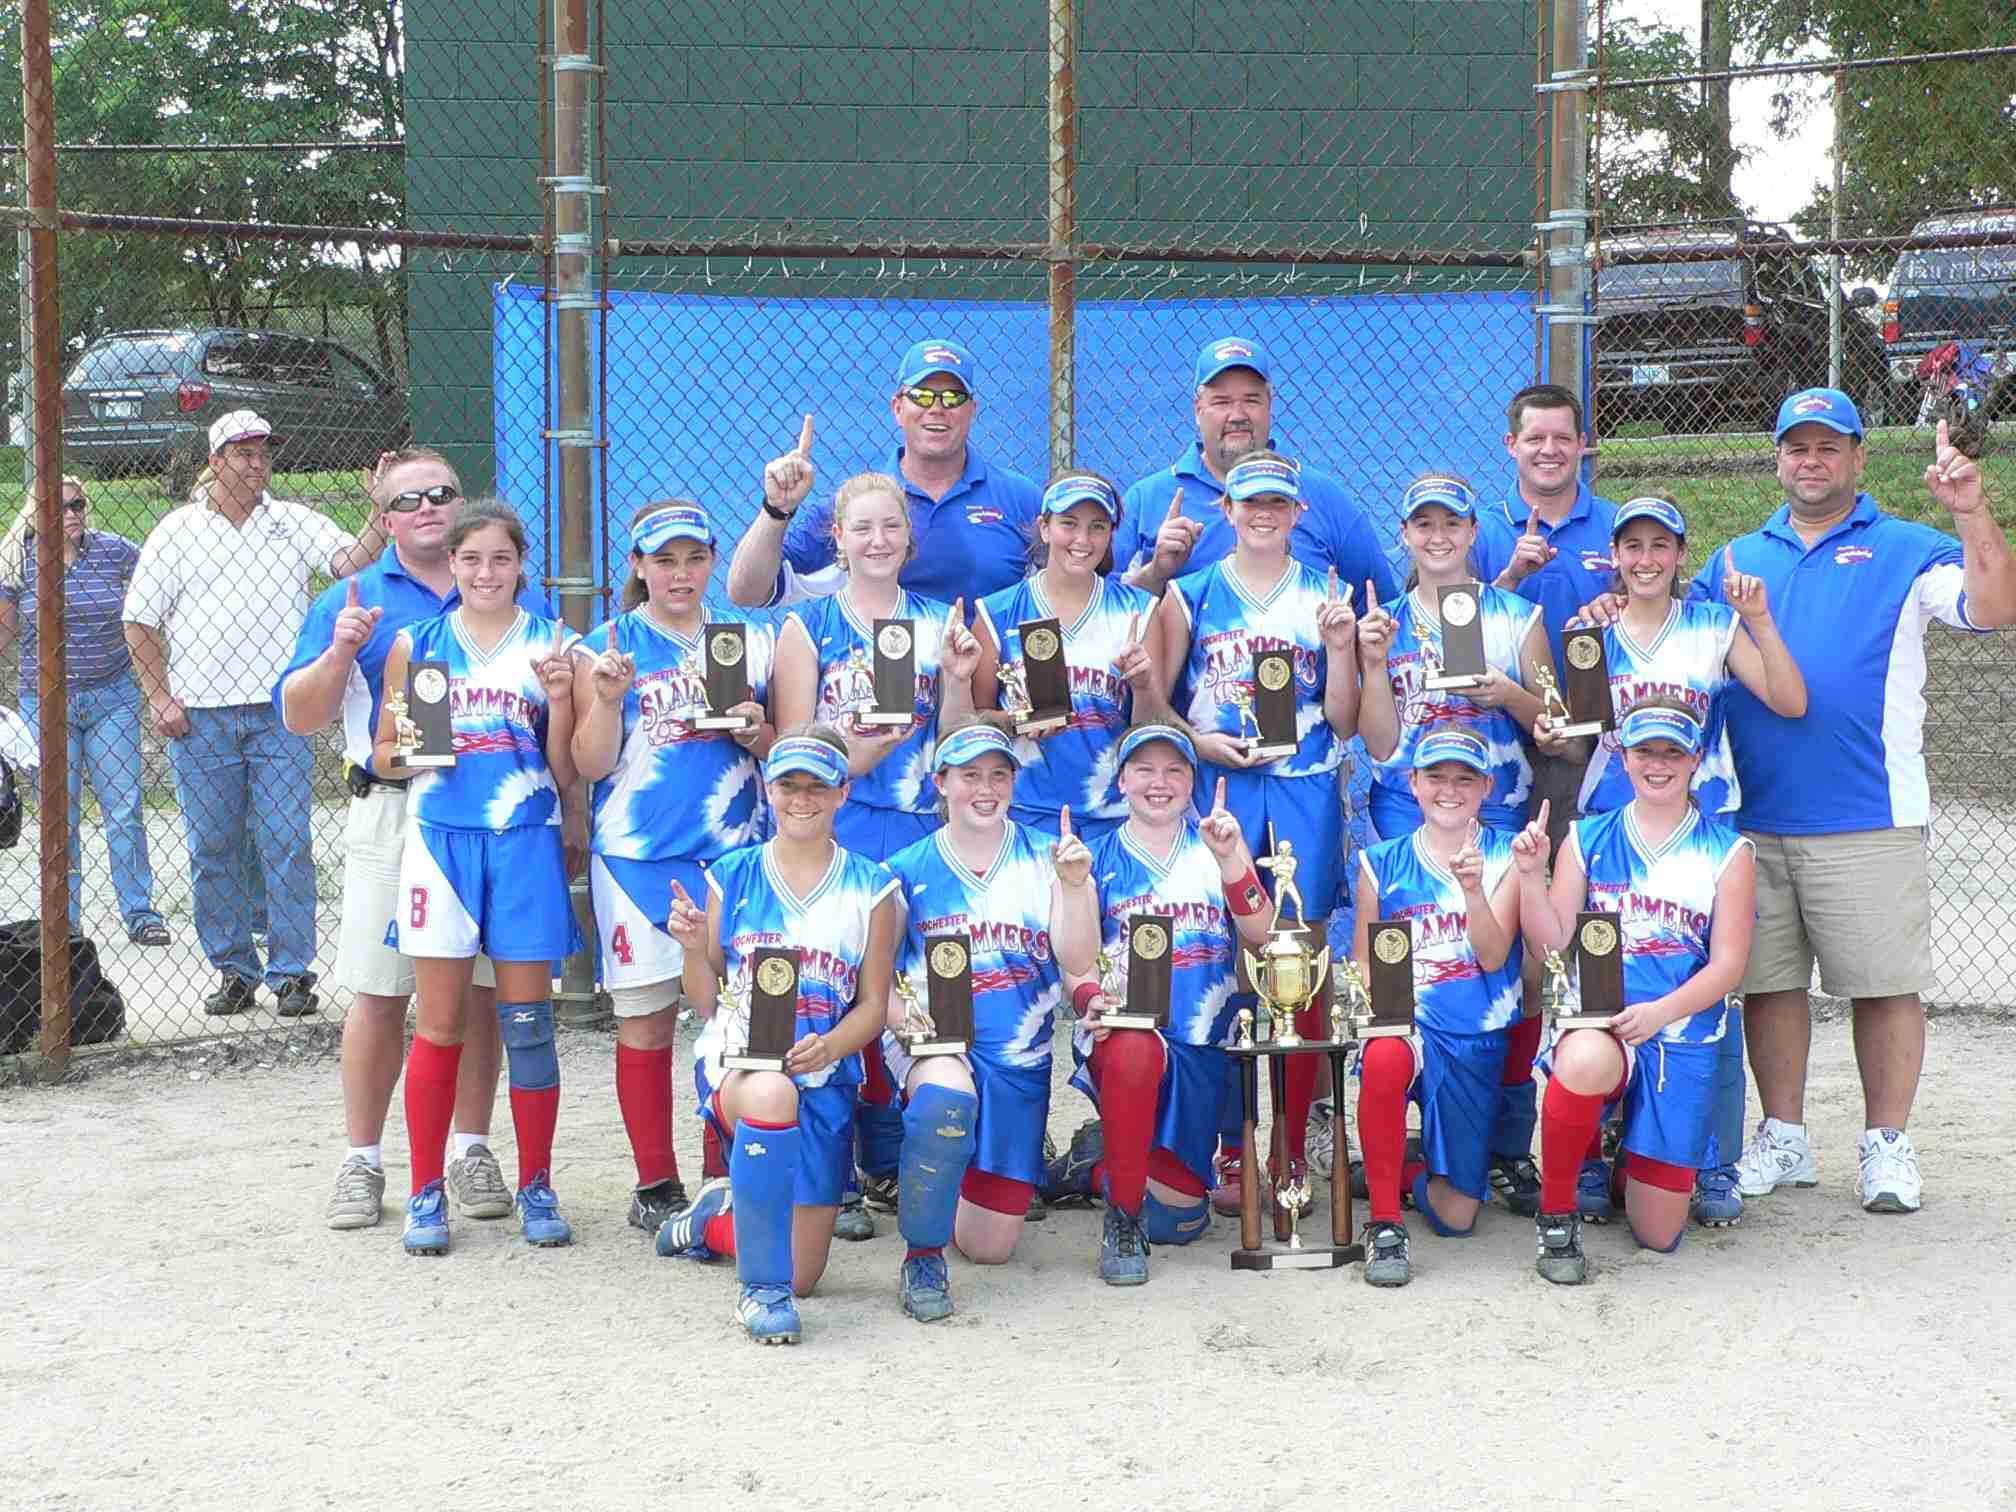 2006 NE-ASA Regional Champions